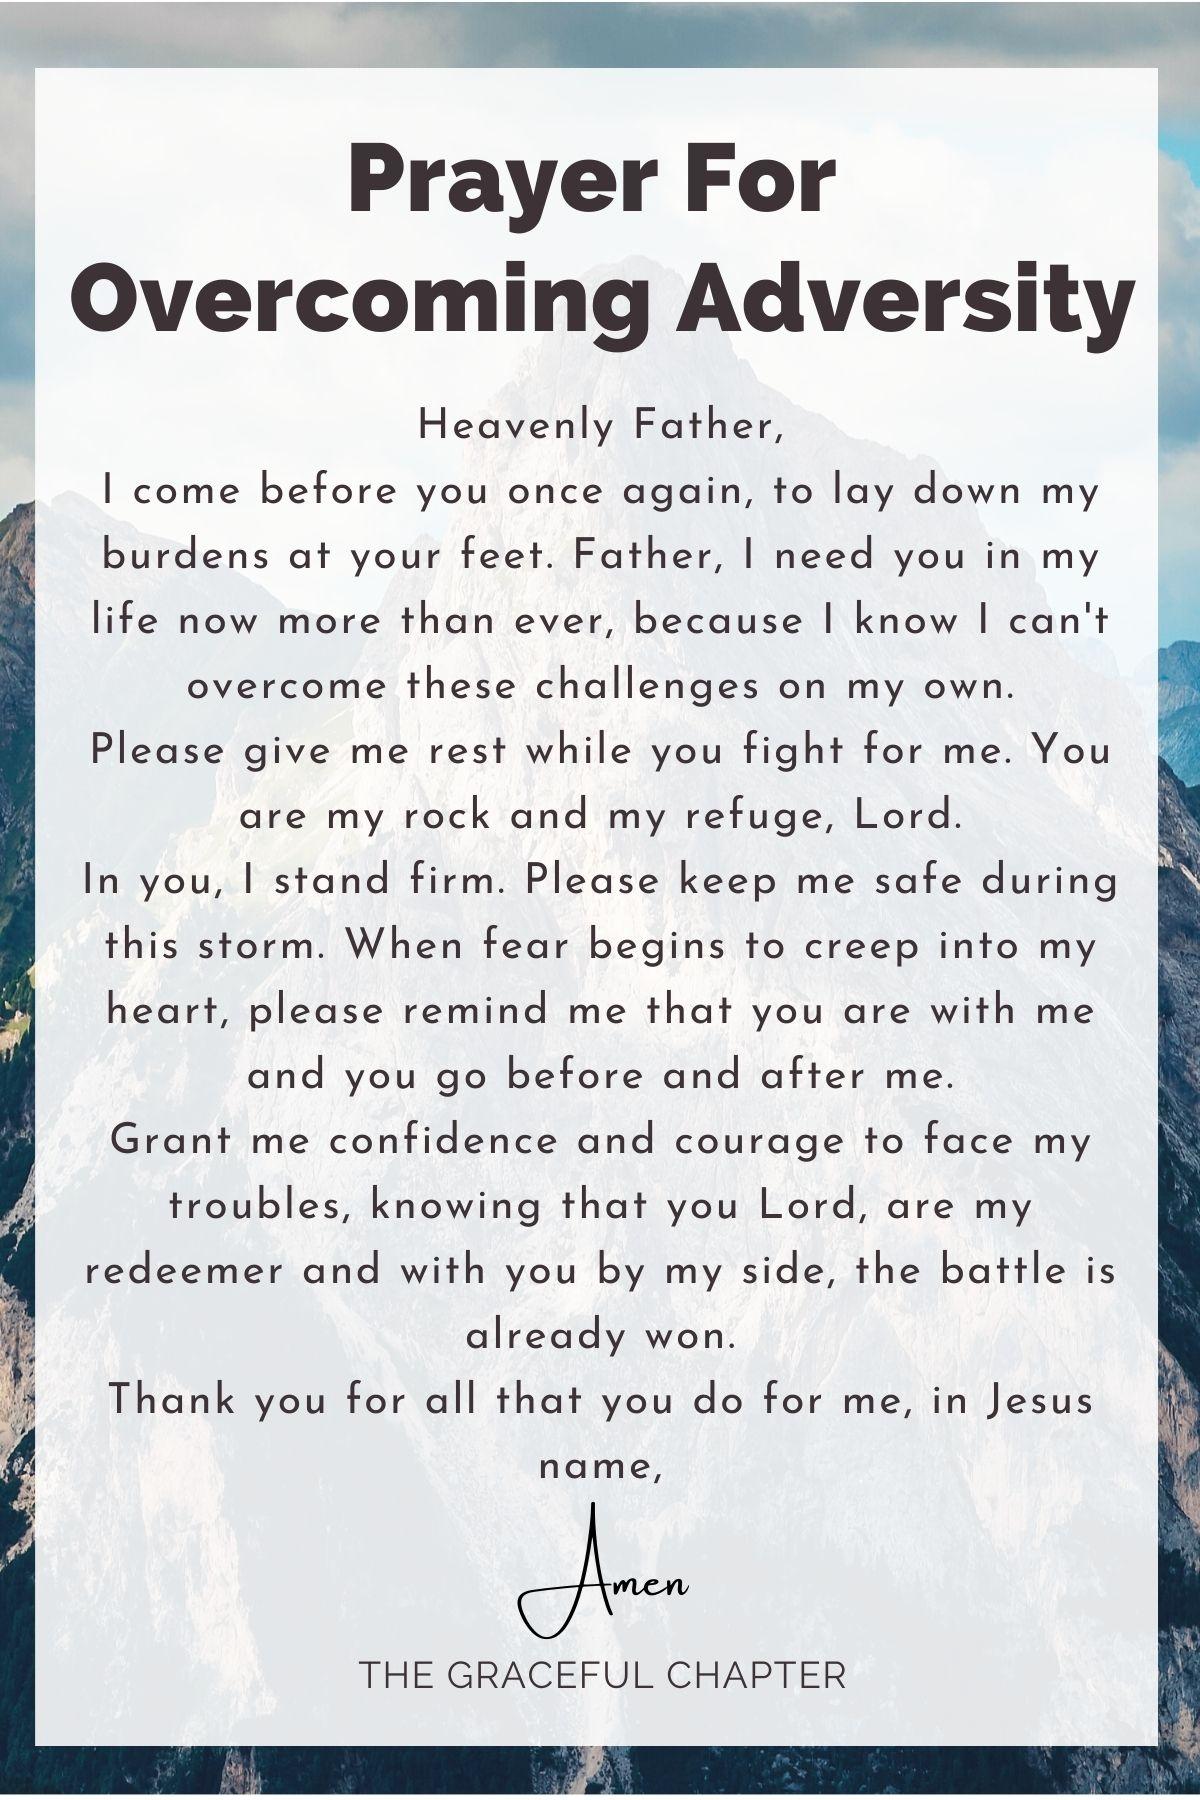 prayer for overcoming adversity